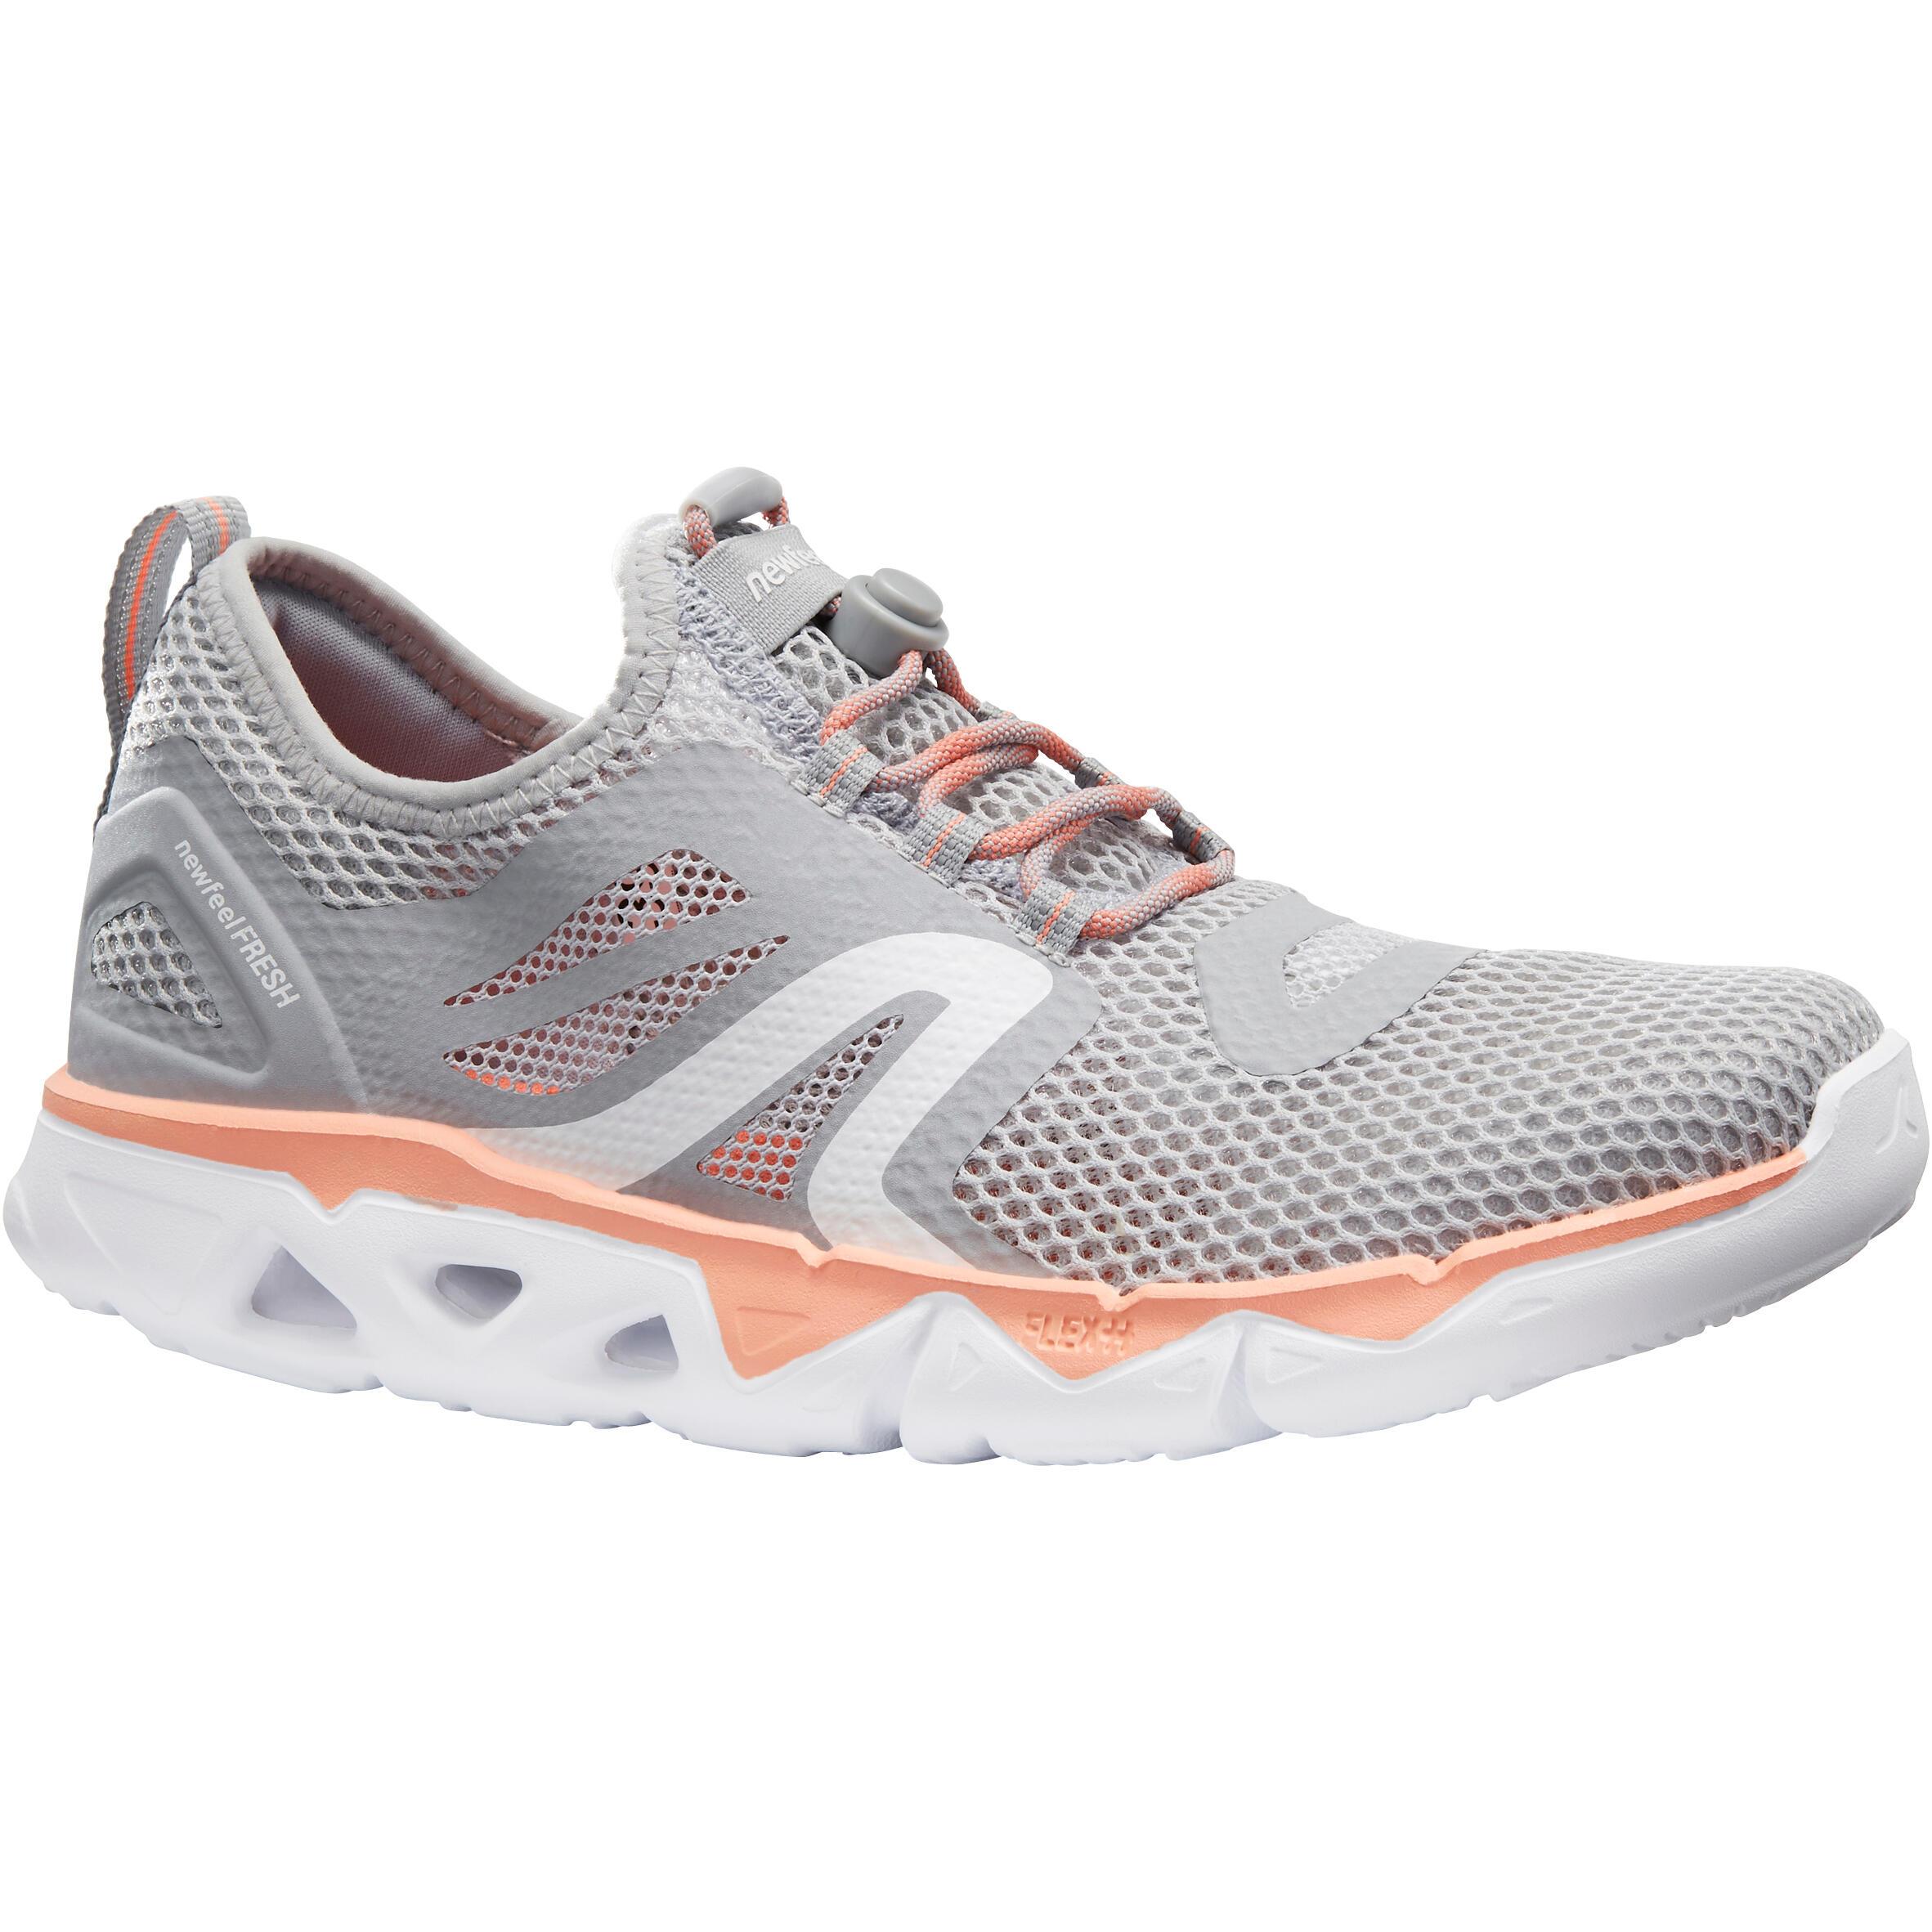 Tenis de caminata deportiva para mujer PW 500 Fresh gris / coral